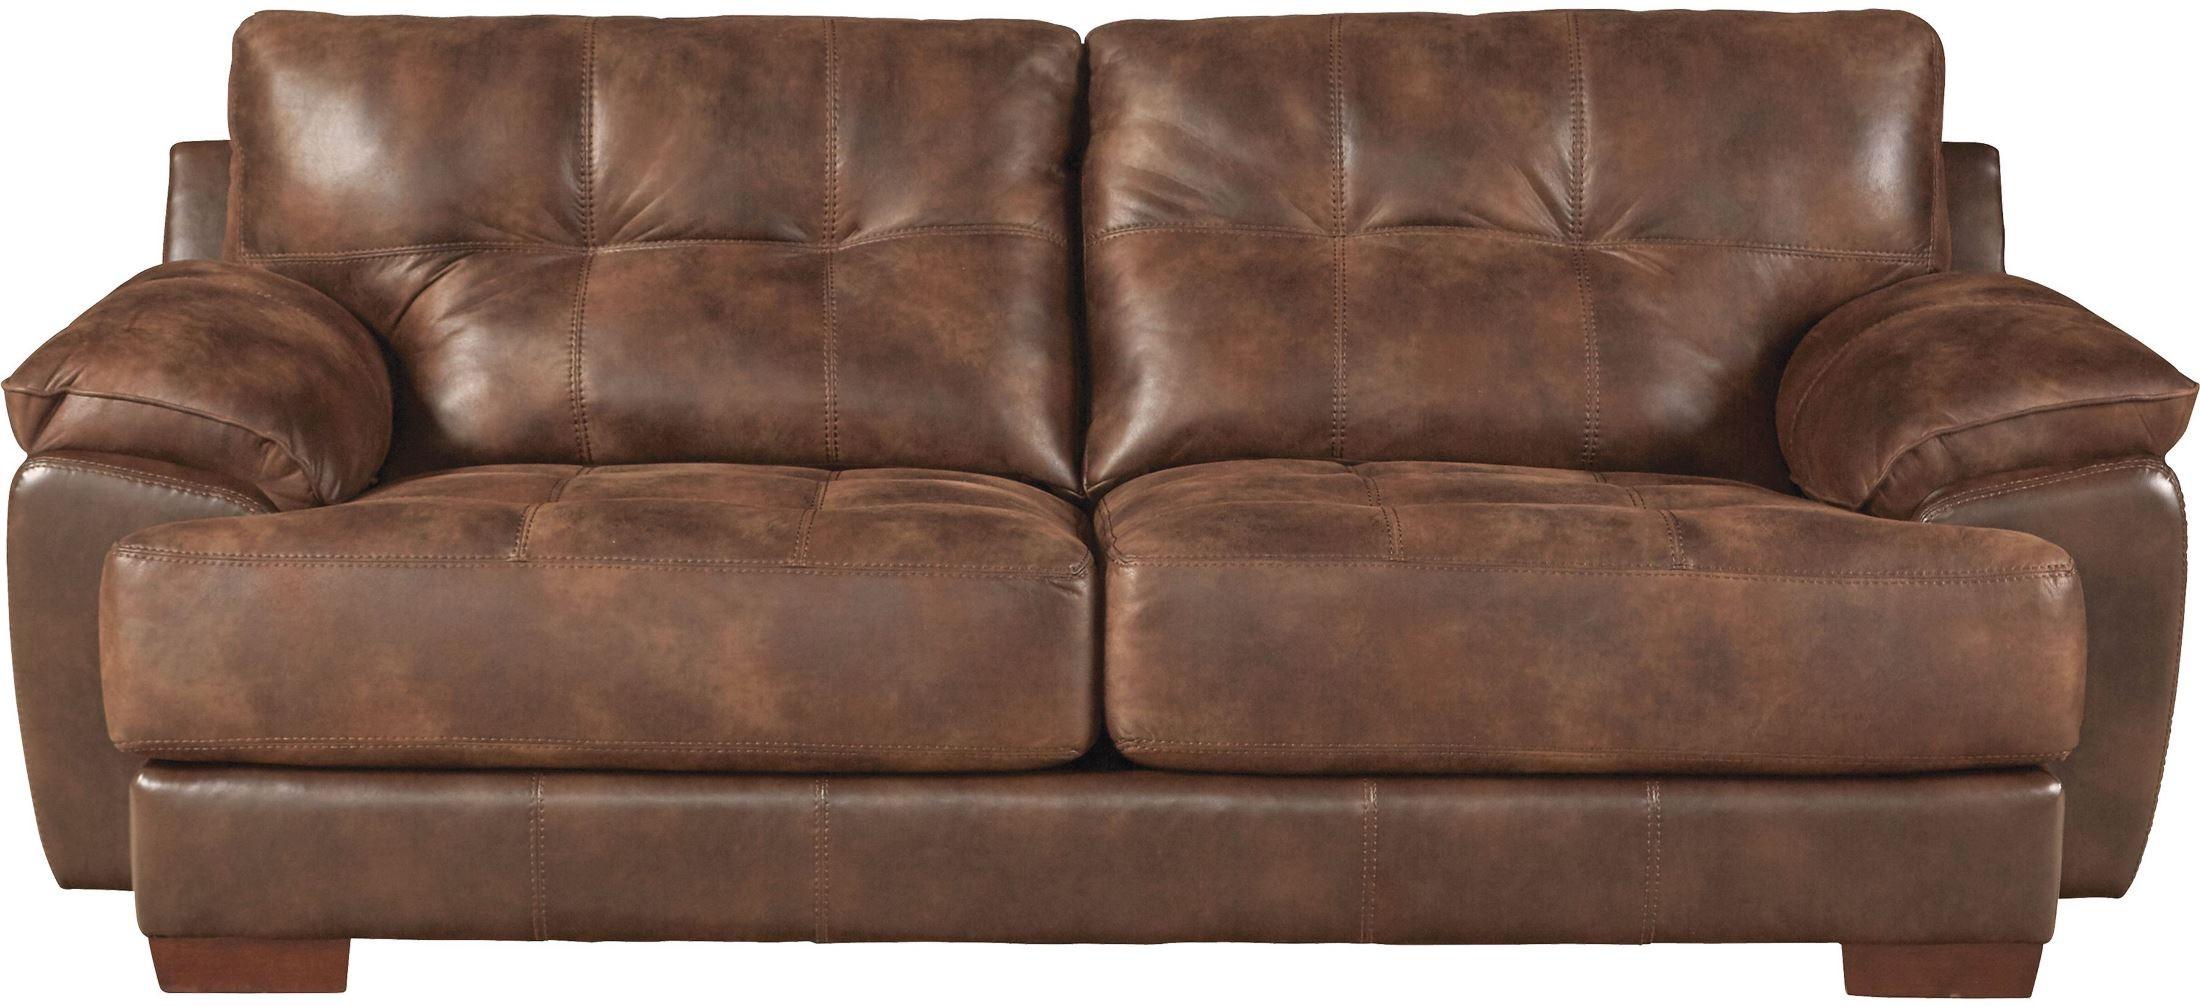 Review Jackson Furniture Drummond